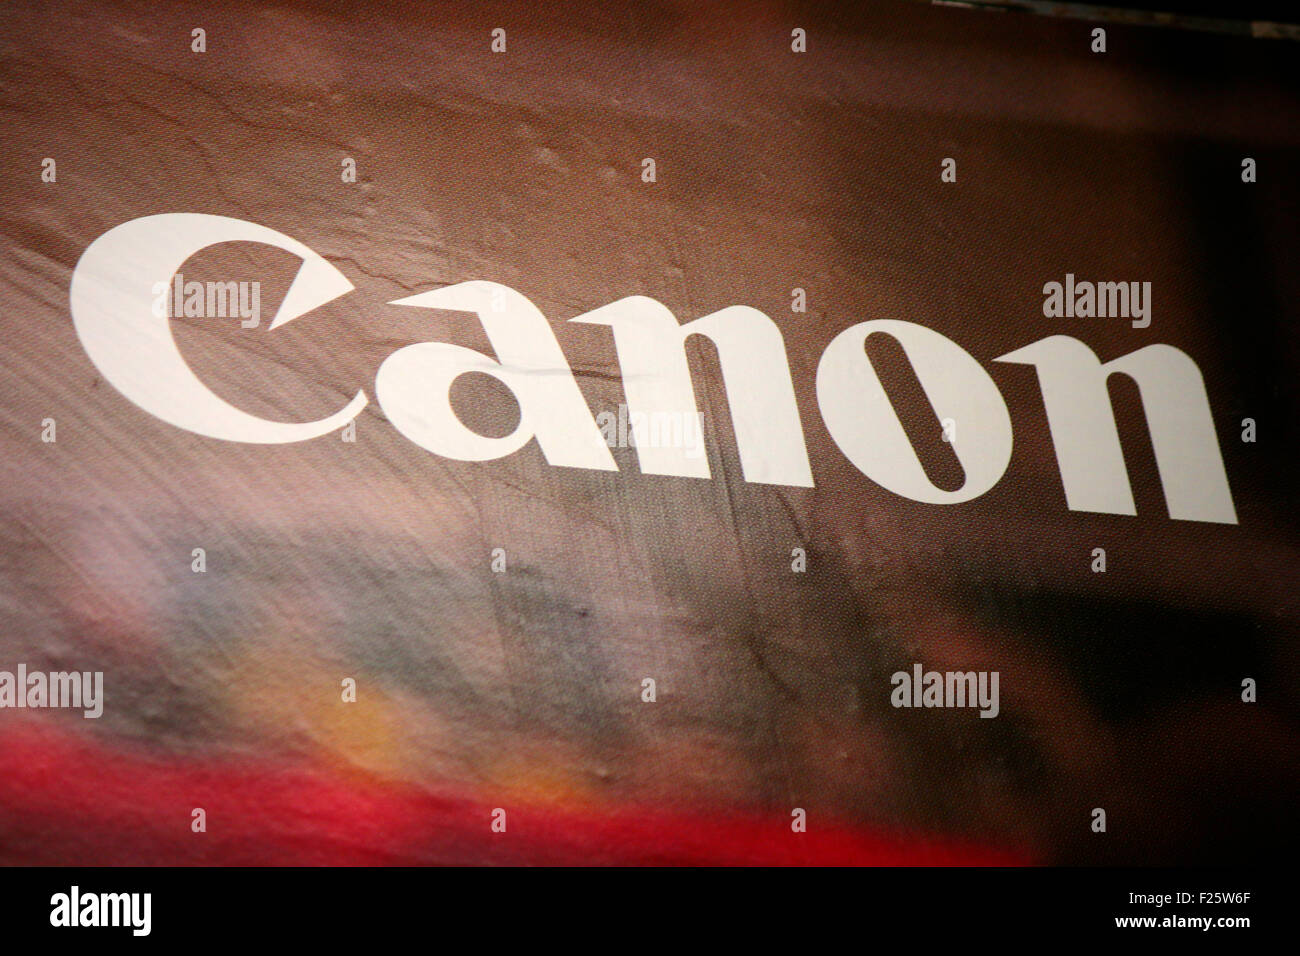 Markennamen: 'Canon', Berlin. - Stock Image